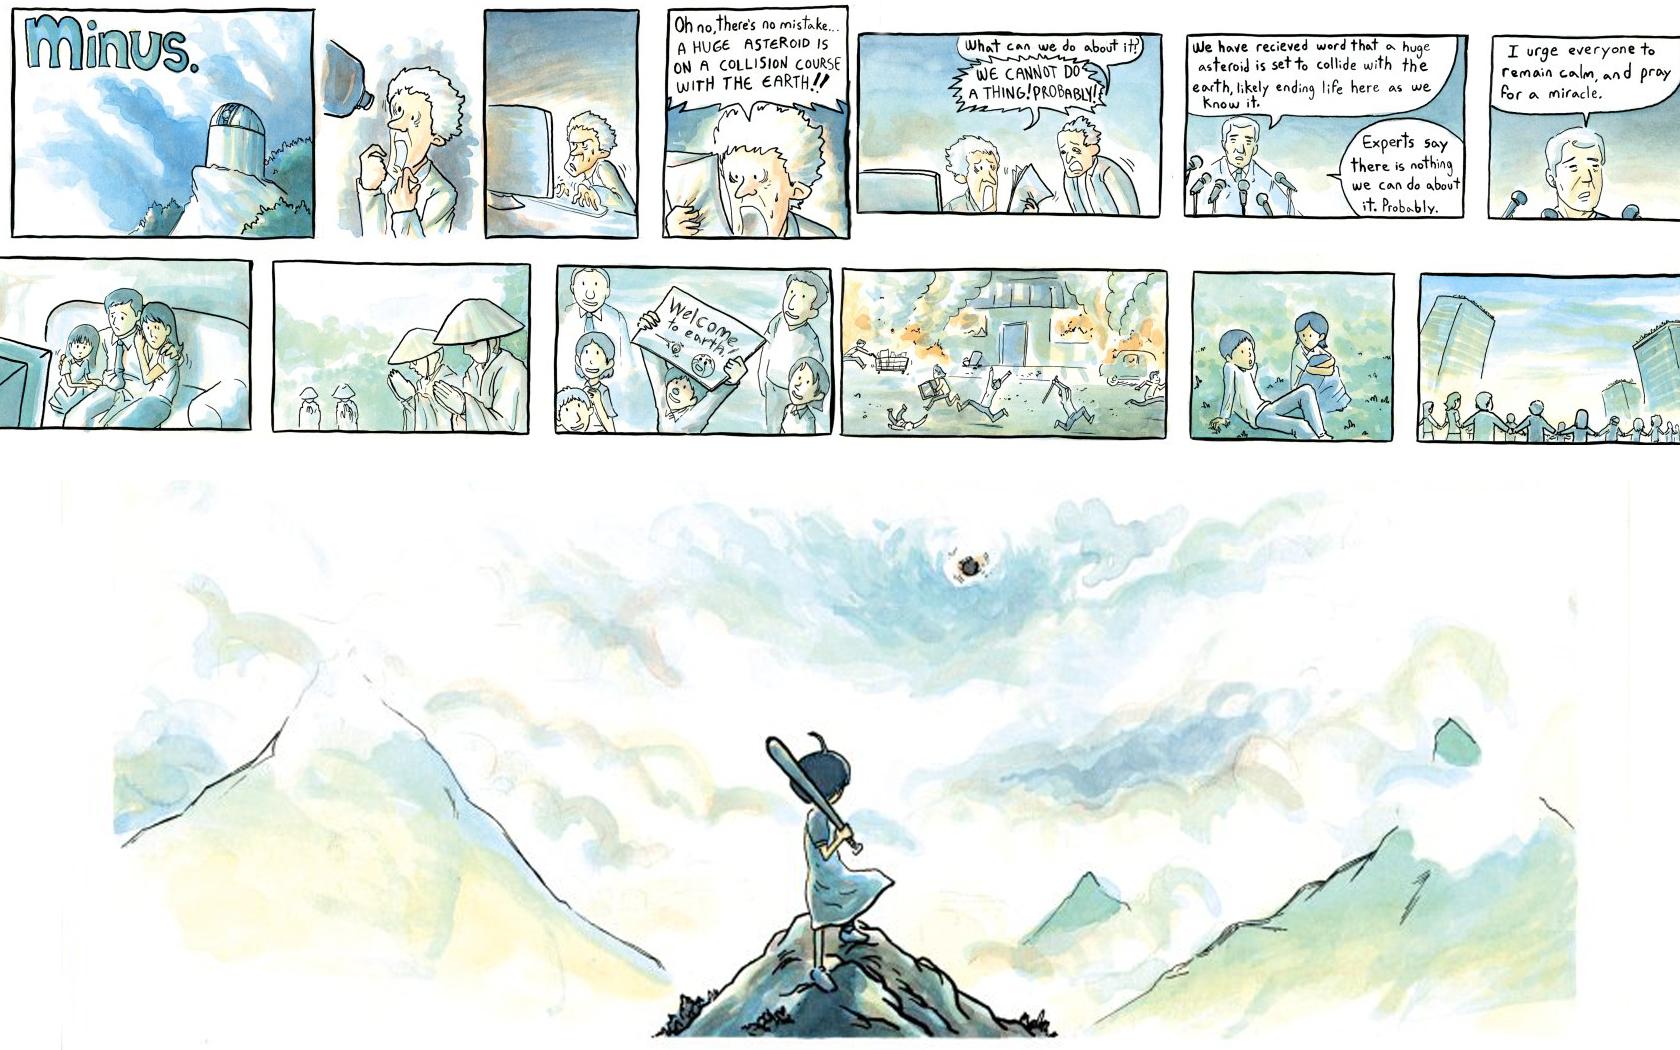 Wallpaper : drawing, illustration, artwork, cartoon, asteroid ...